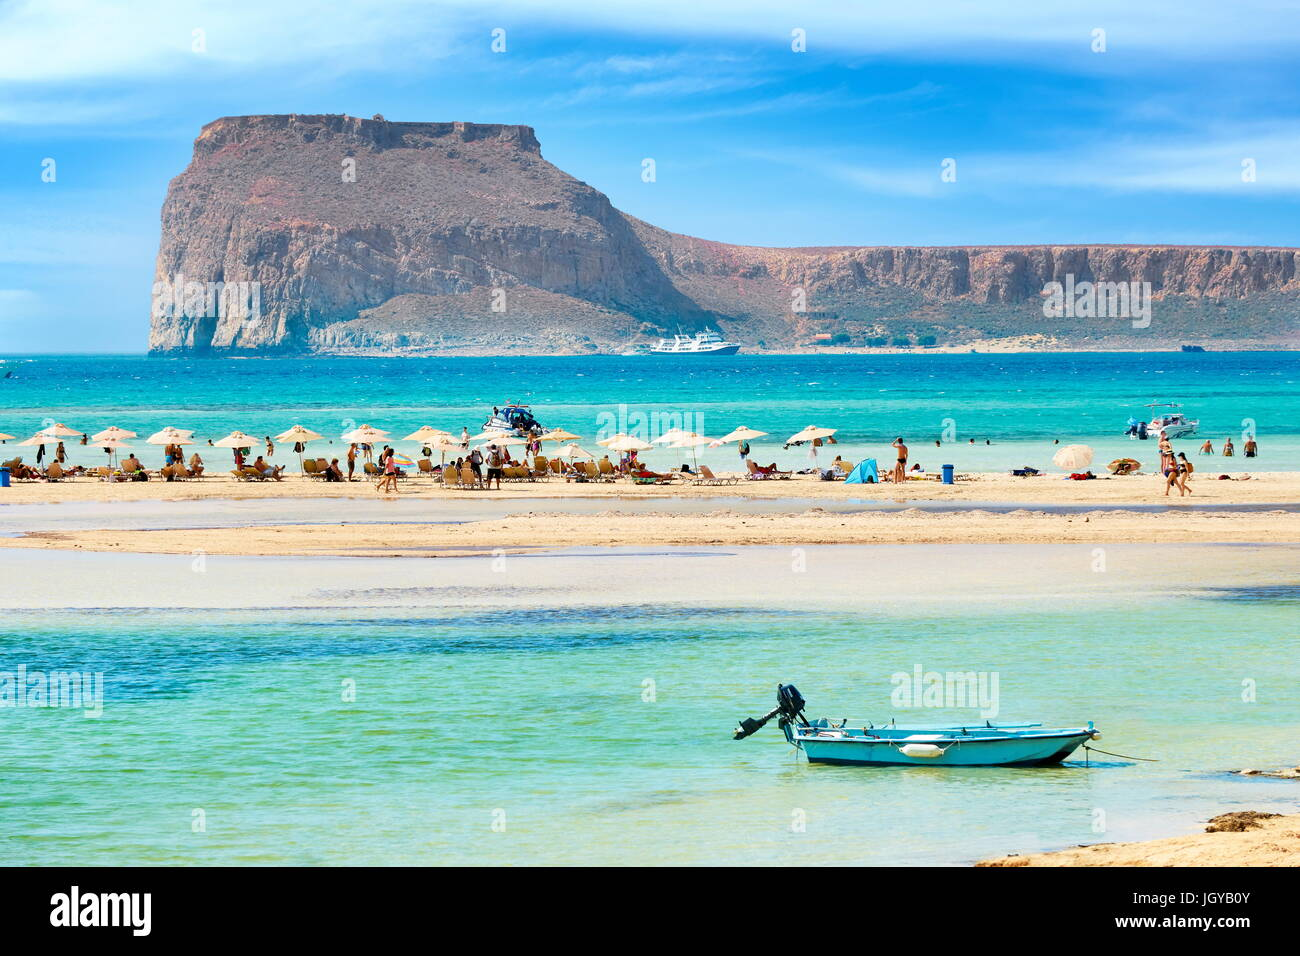 Balos Beach, Gramvousa Halbinsel, Insel Kreta, Griechenland Stockbild